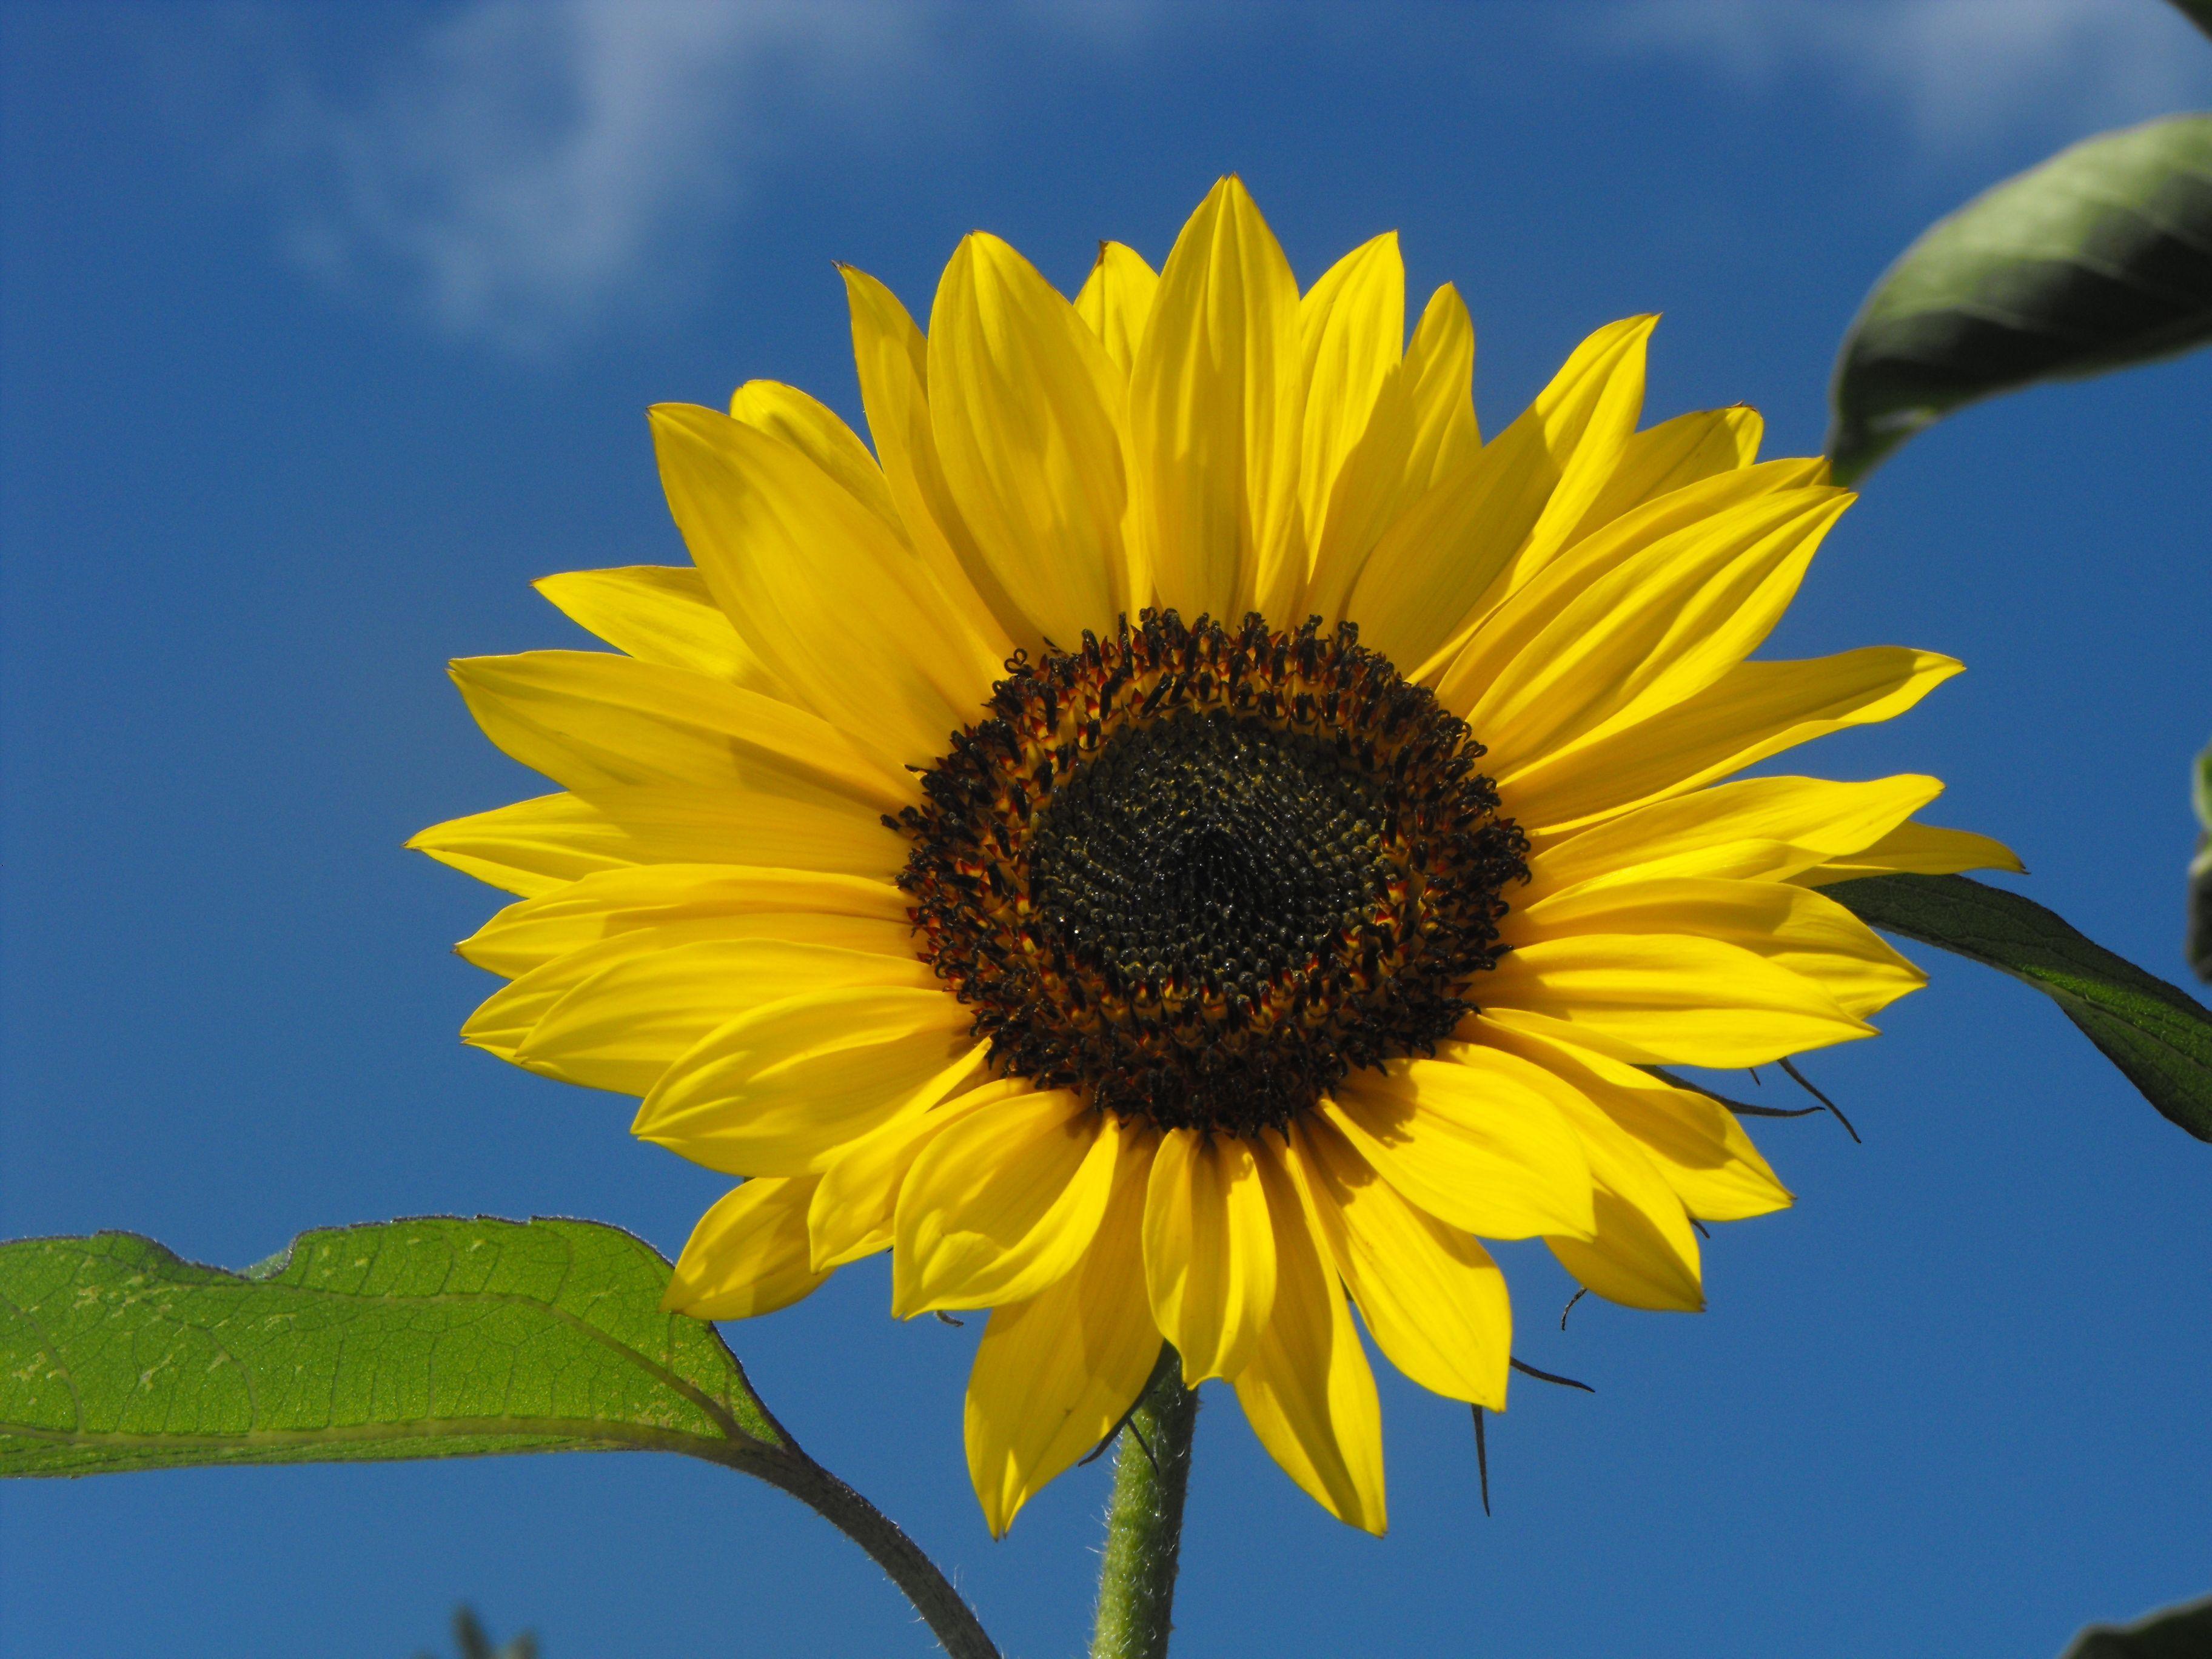 Gambar Bunga Matahari Yang Cantik Wallpaper Foto Dan Gambar Bunga Cantik Untuk Laptop Beautiful Wallpaper Foto Dan Gambar Bunga Di 2020 Bunga Matahari Bunga Gambar